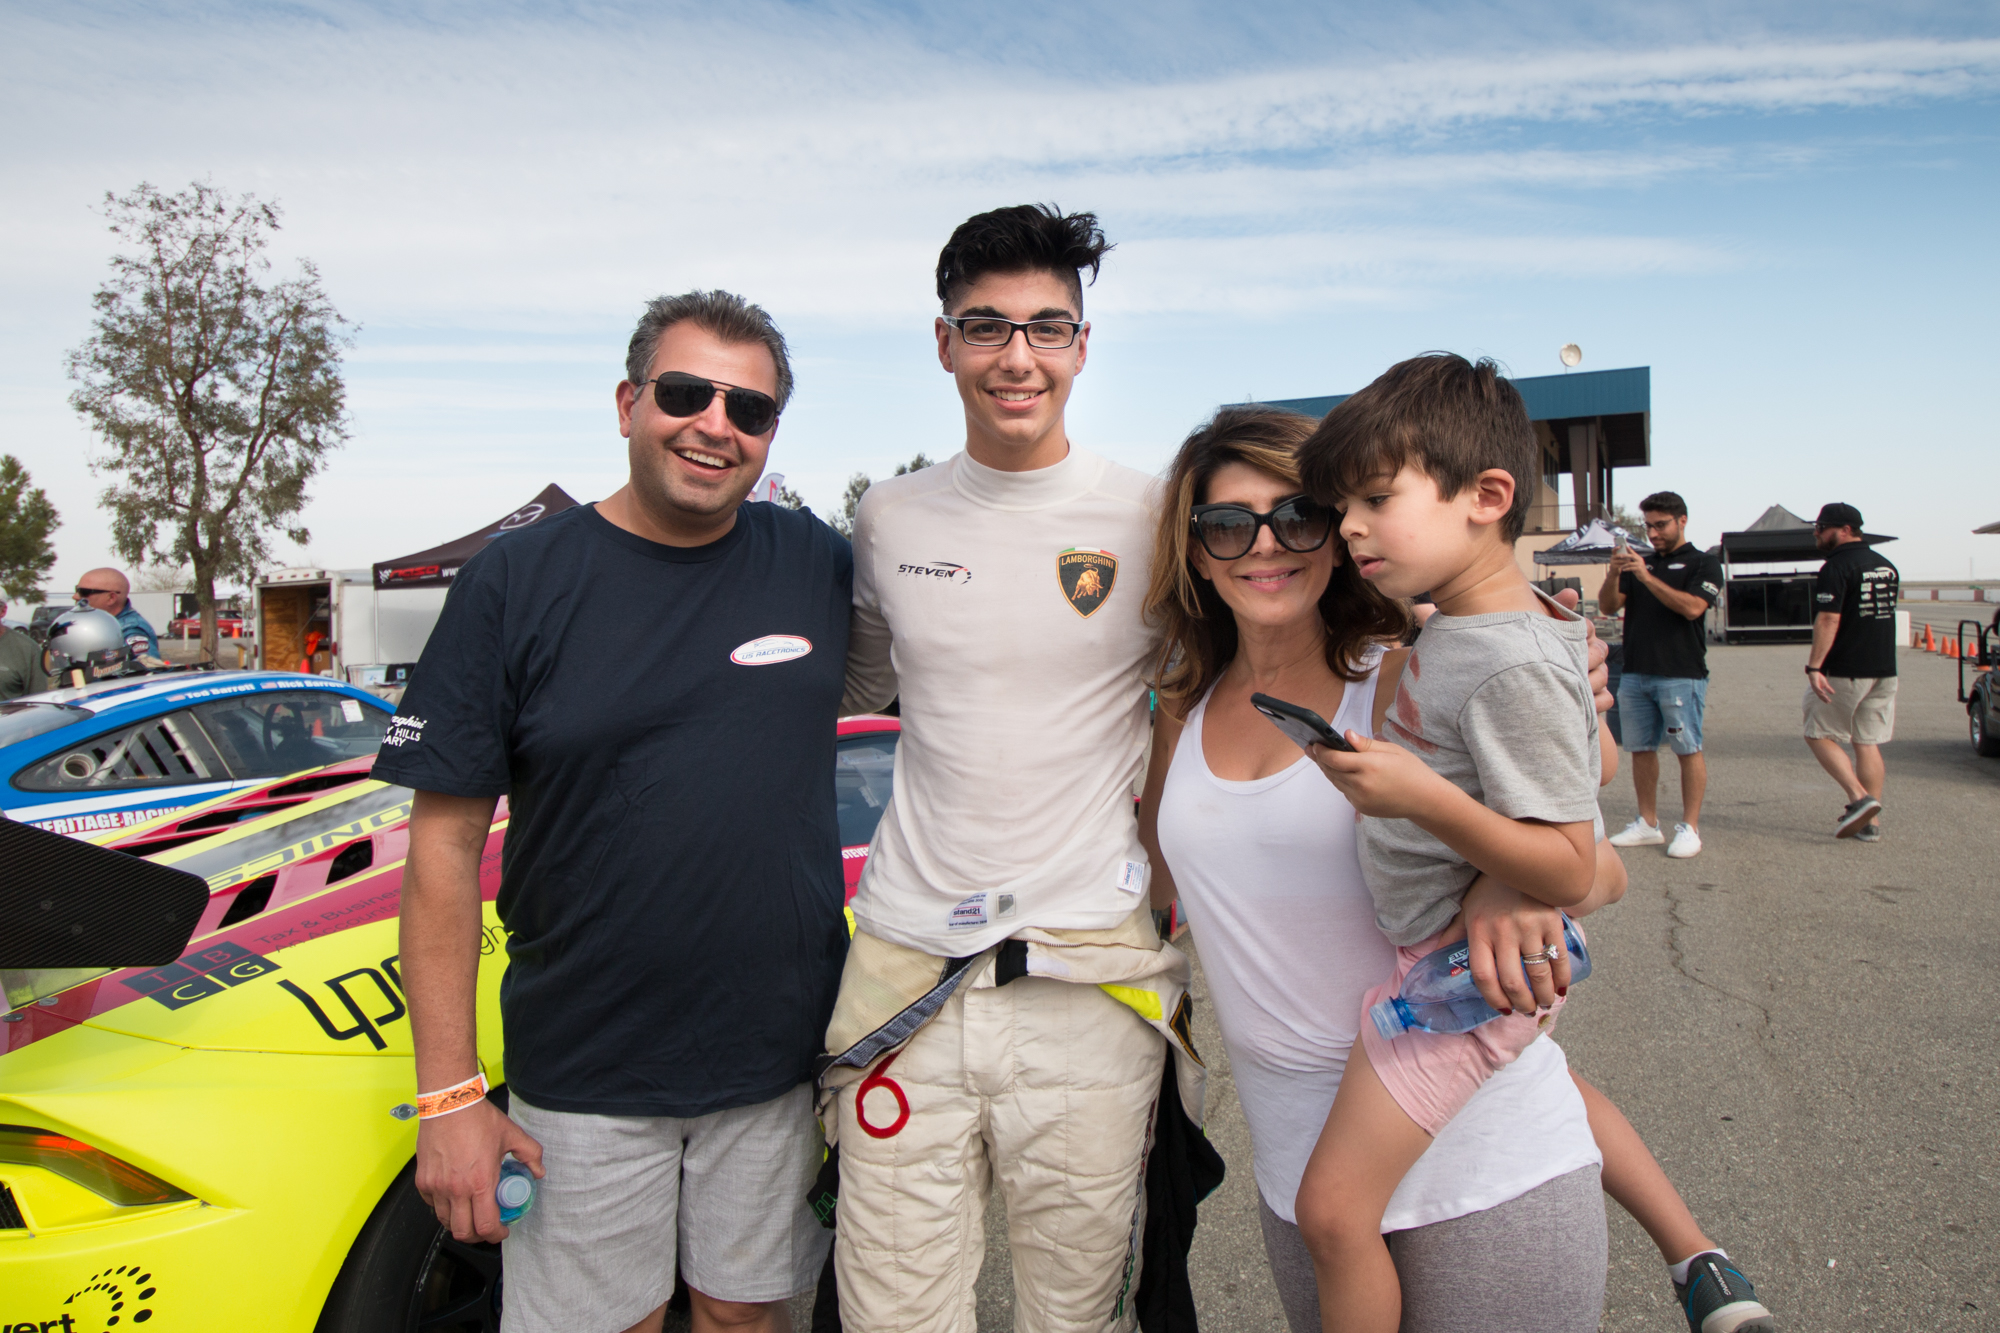 Steven-Racing-20130301-55655.jpg